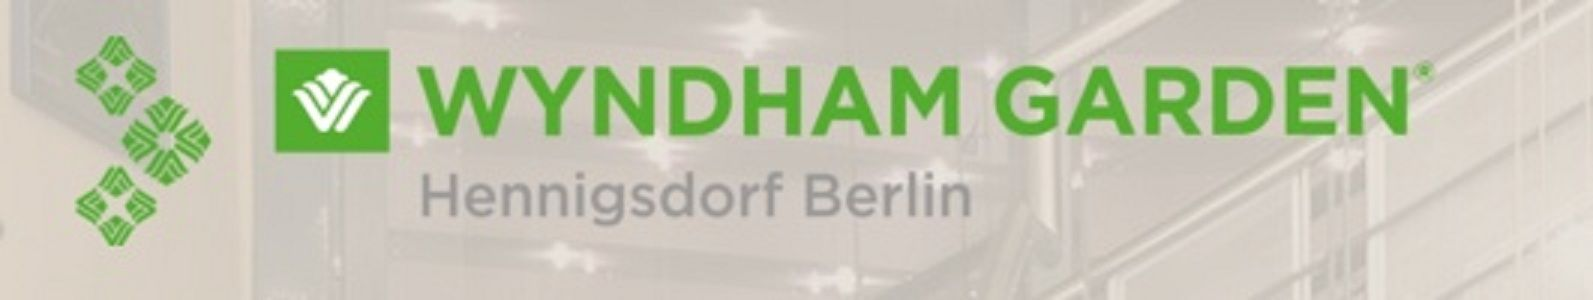 Https Www Wyndhamgardenhennigsdorf Com De Marketing Promotion Hennigsdorf